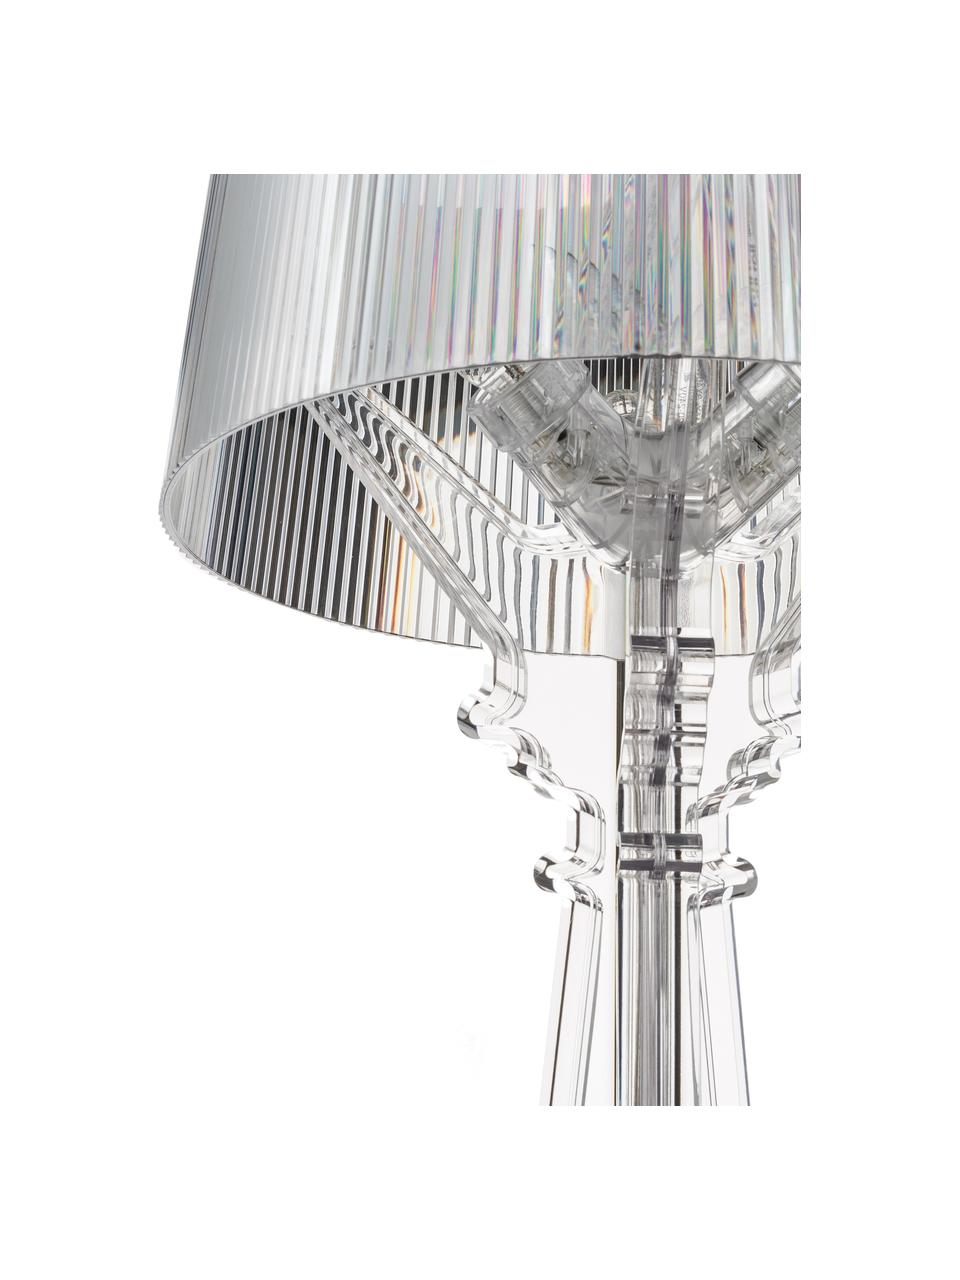 Große Design Tischlampe Bourgie, Lampenschirm: Polykarbonat, Lampenfuß: Polykarbonat, Transparent, Ø 37 x H 78 cm